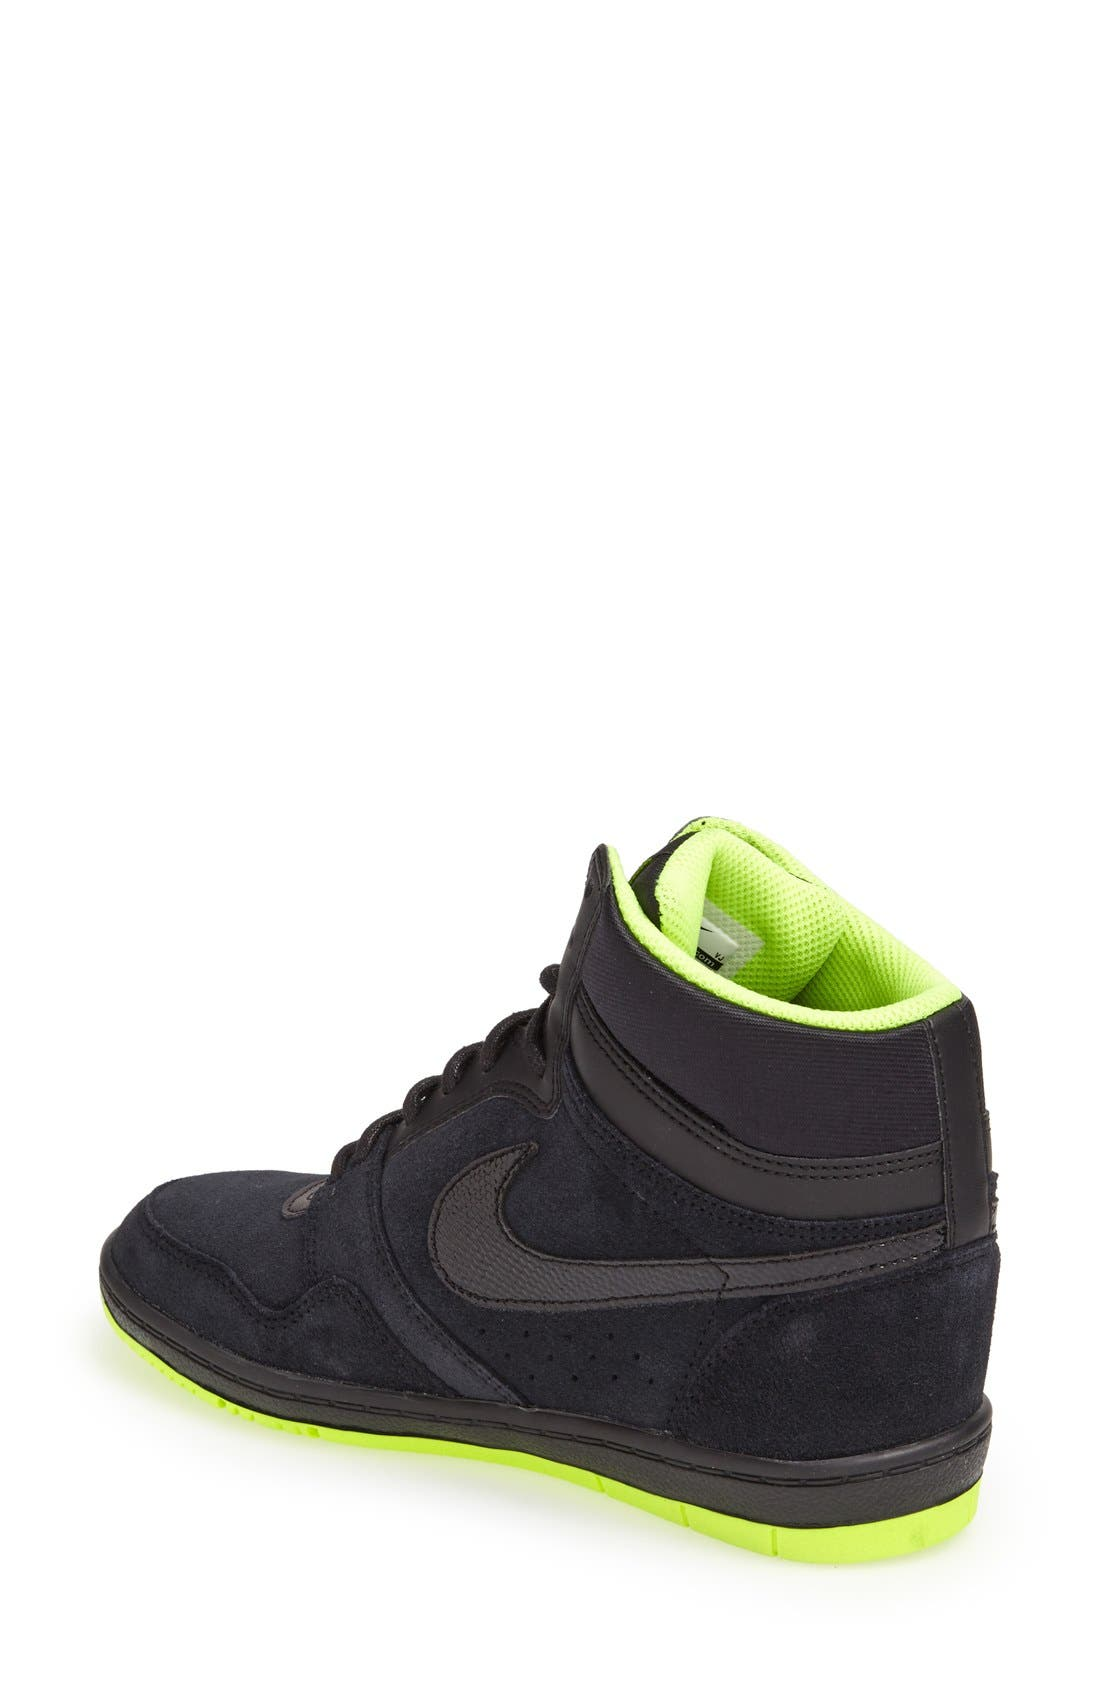 'Force Sky High' Sneaker,                             Alternate thumbnail 2, color,                             006